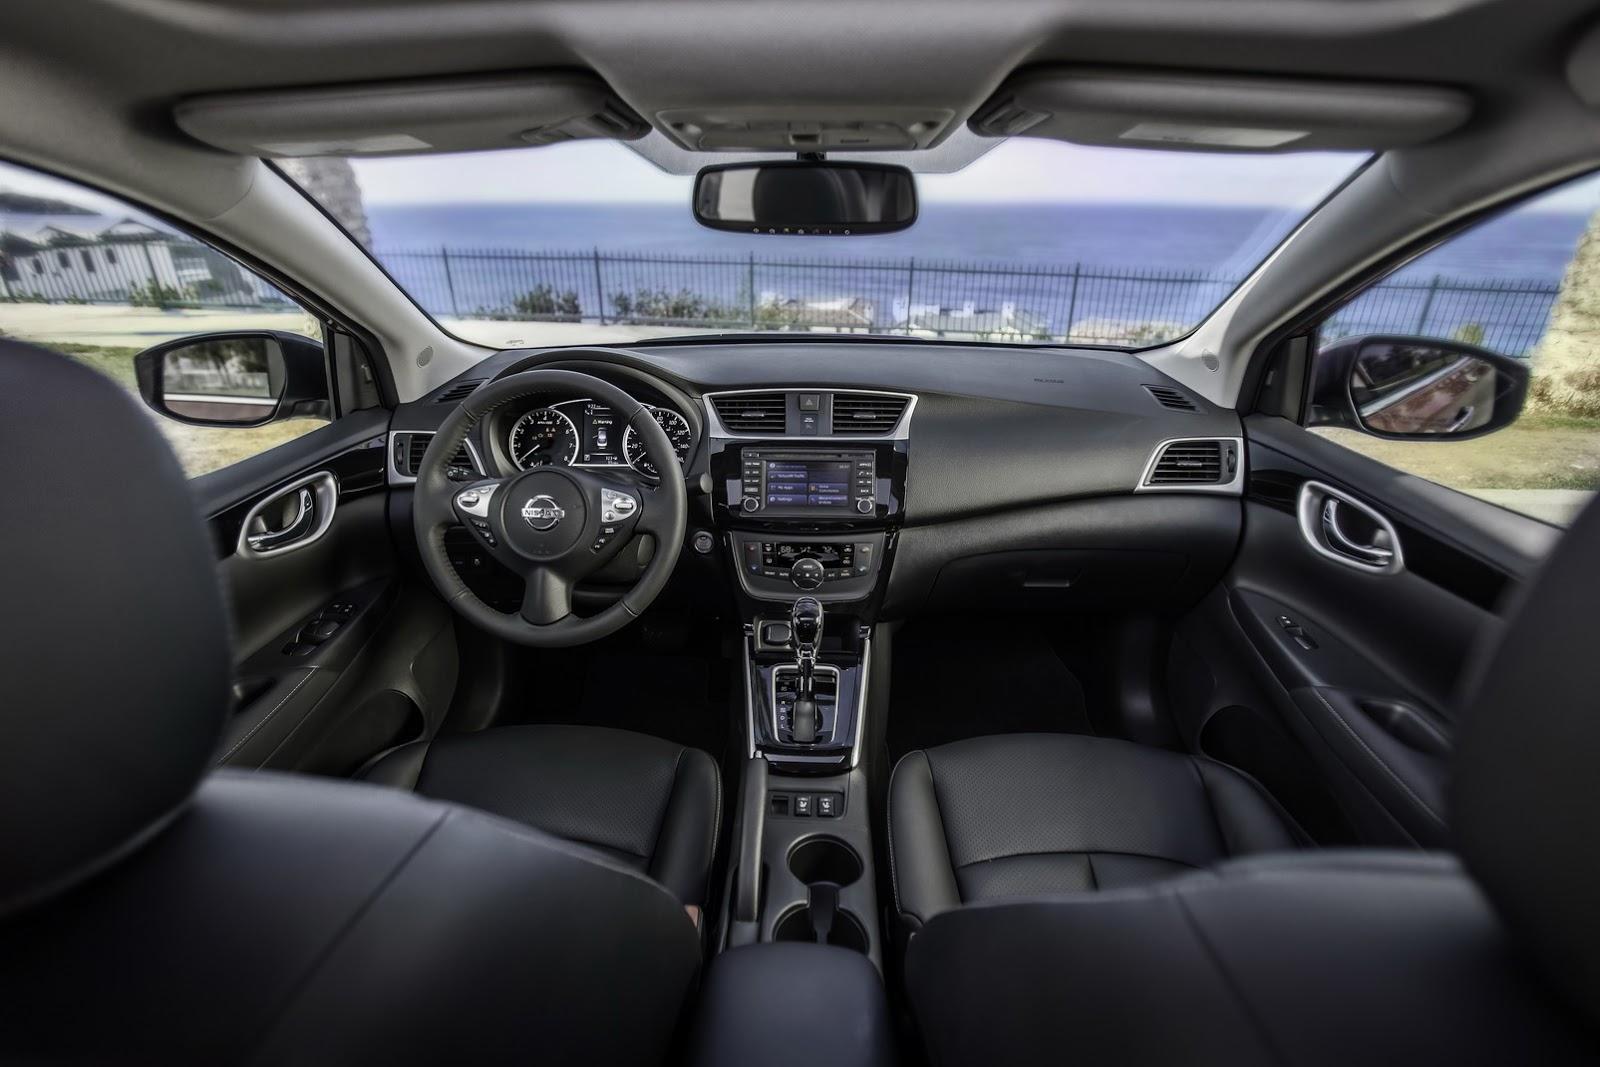 Nissan Sentra 2017 Interior A Noticia Do Ceara